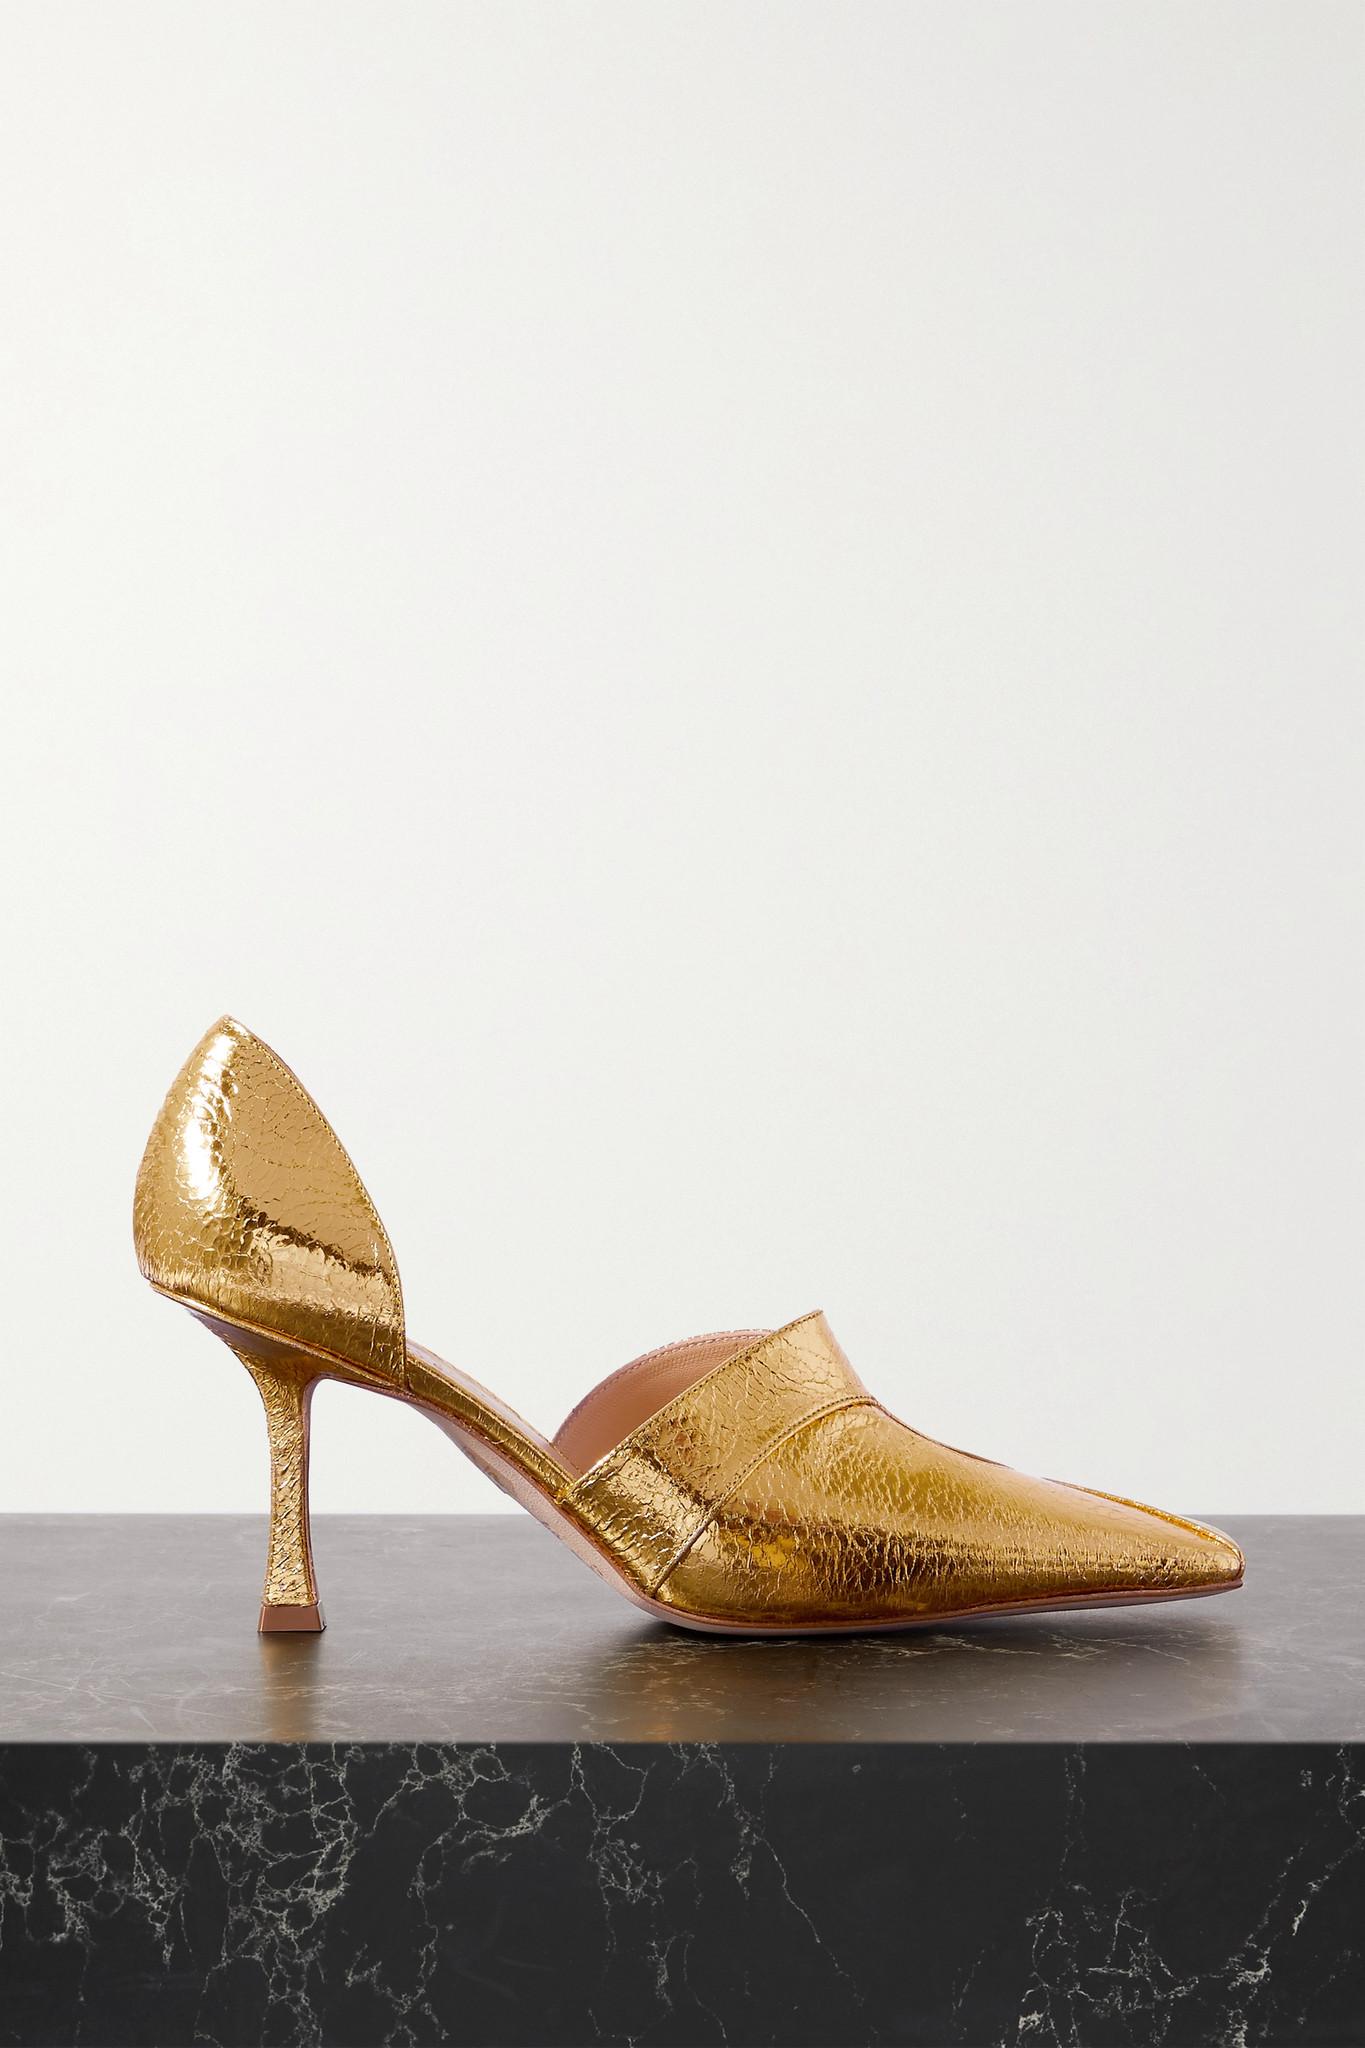 A.W.A.K.E. MODE - Loretta 挖剪金属感人造纹理皮革高跟鞋 - 金色 - IT38